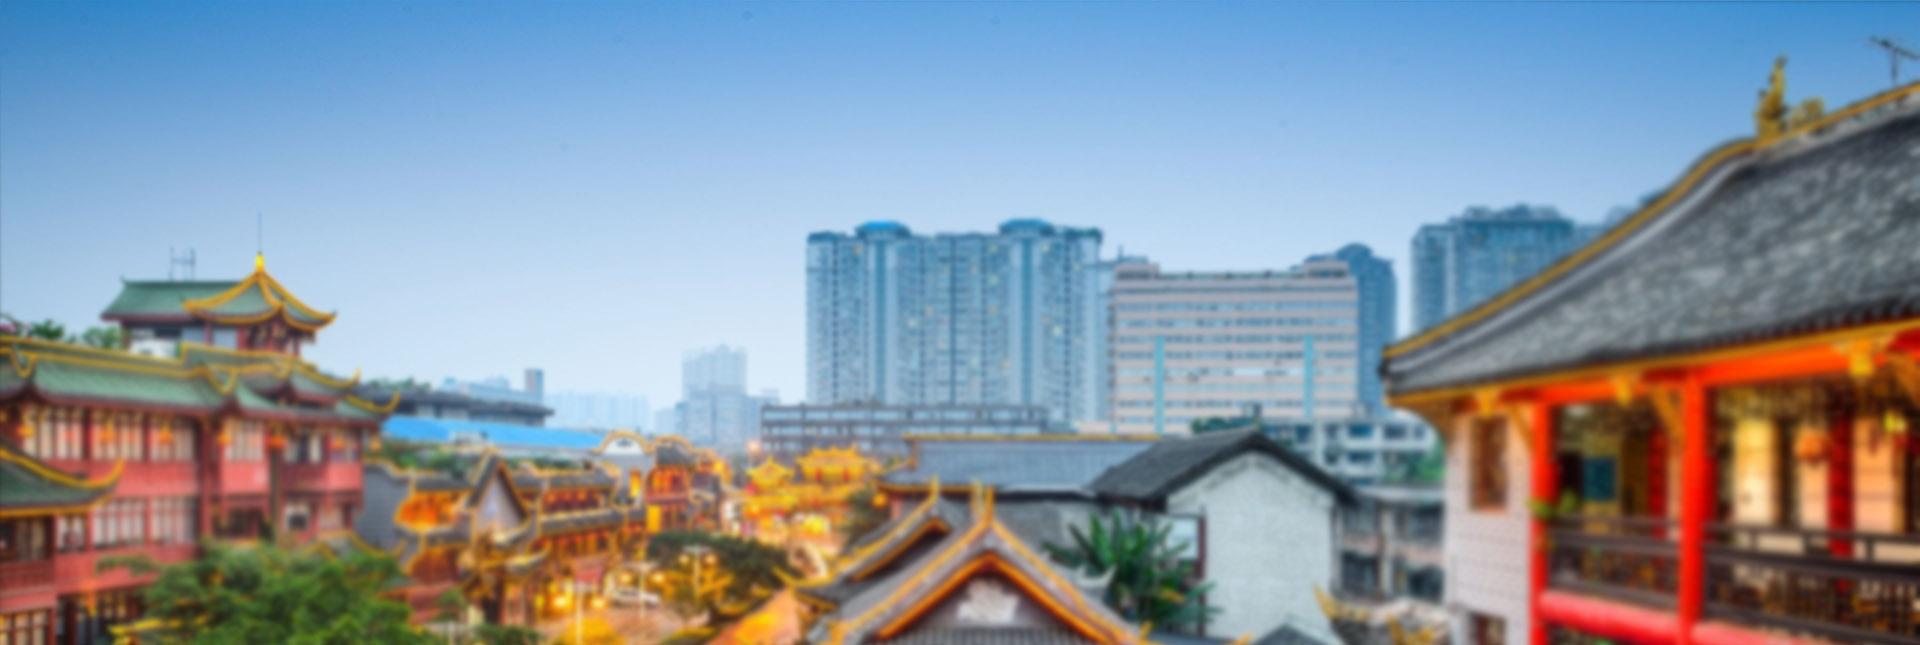 Chengdu China Tours Top 10 China Tours From Chengdu 2018